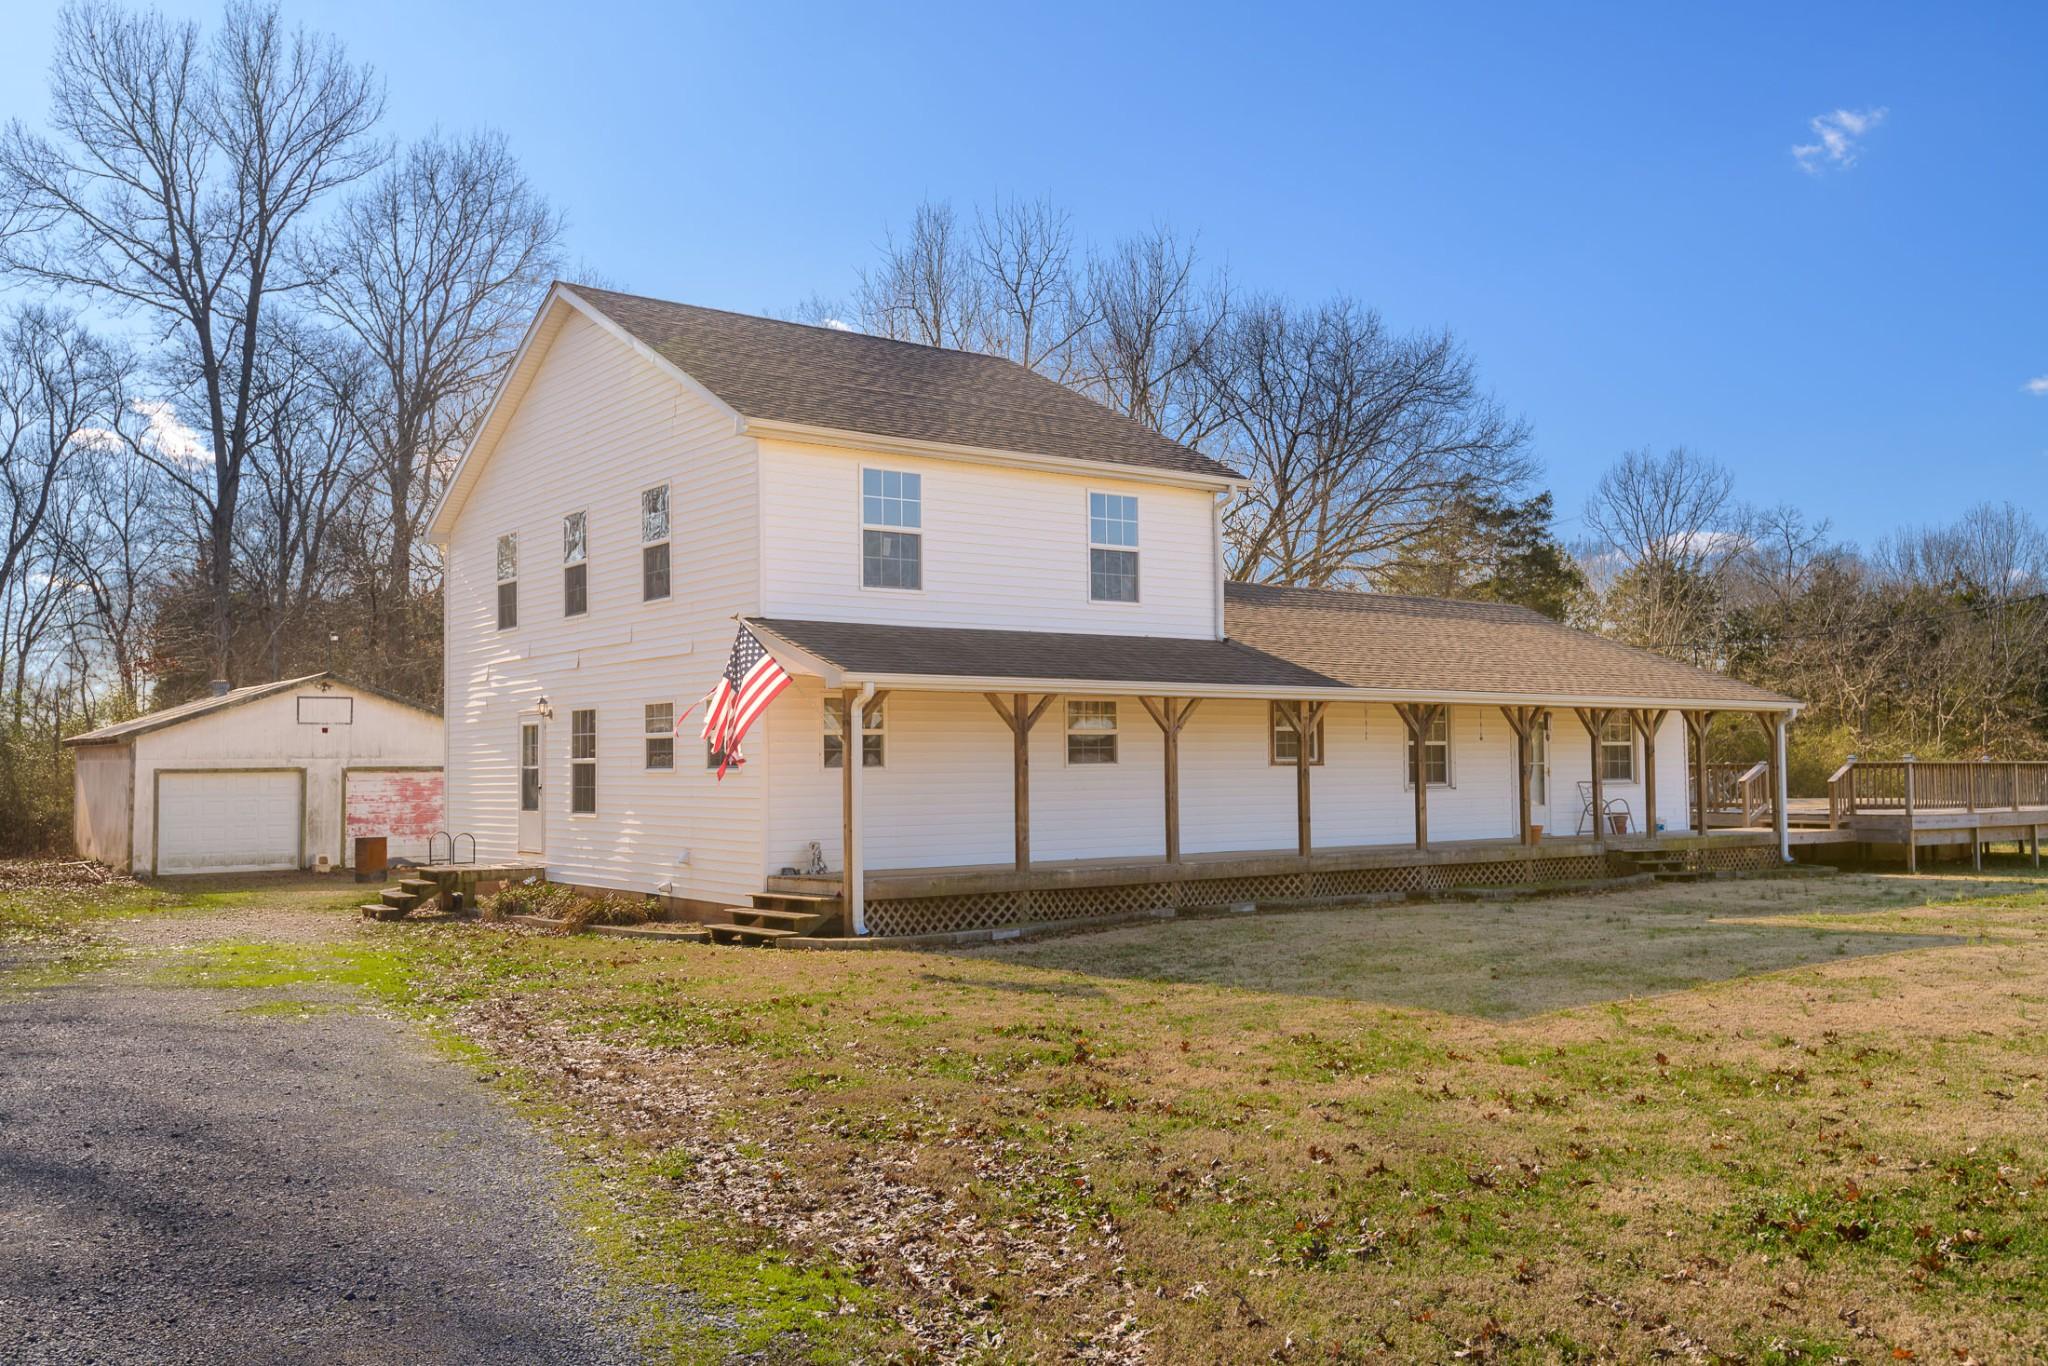 281 Clardy Rd, Unionville, TN 37180 - Unionville, TN real estate listing